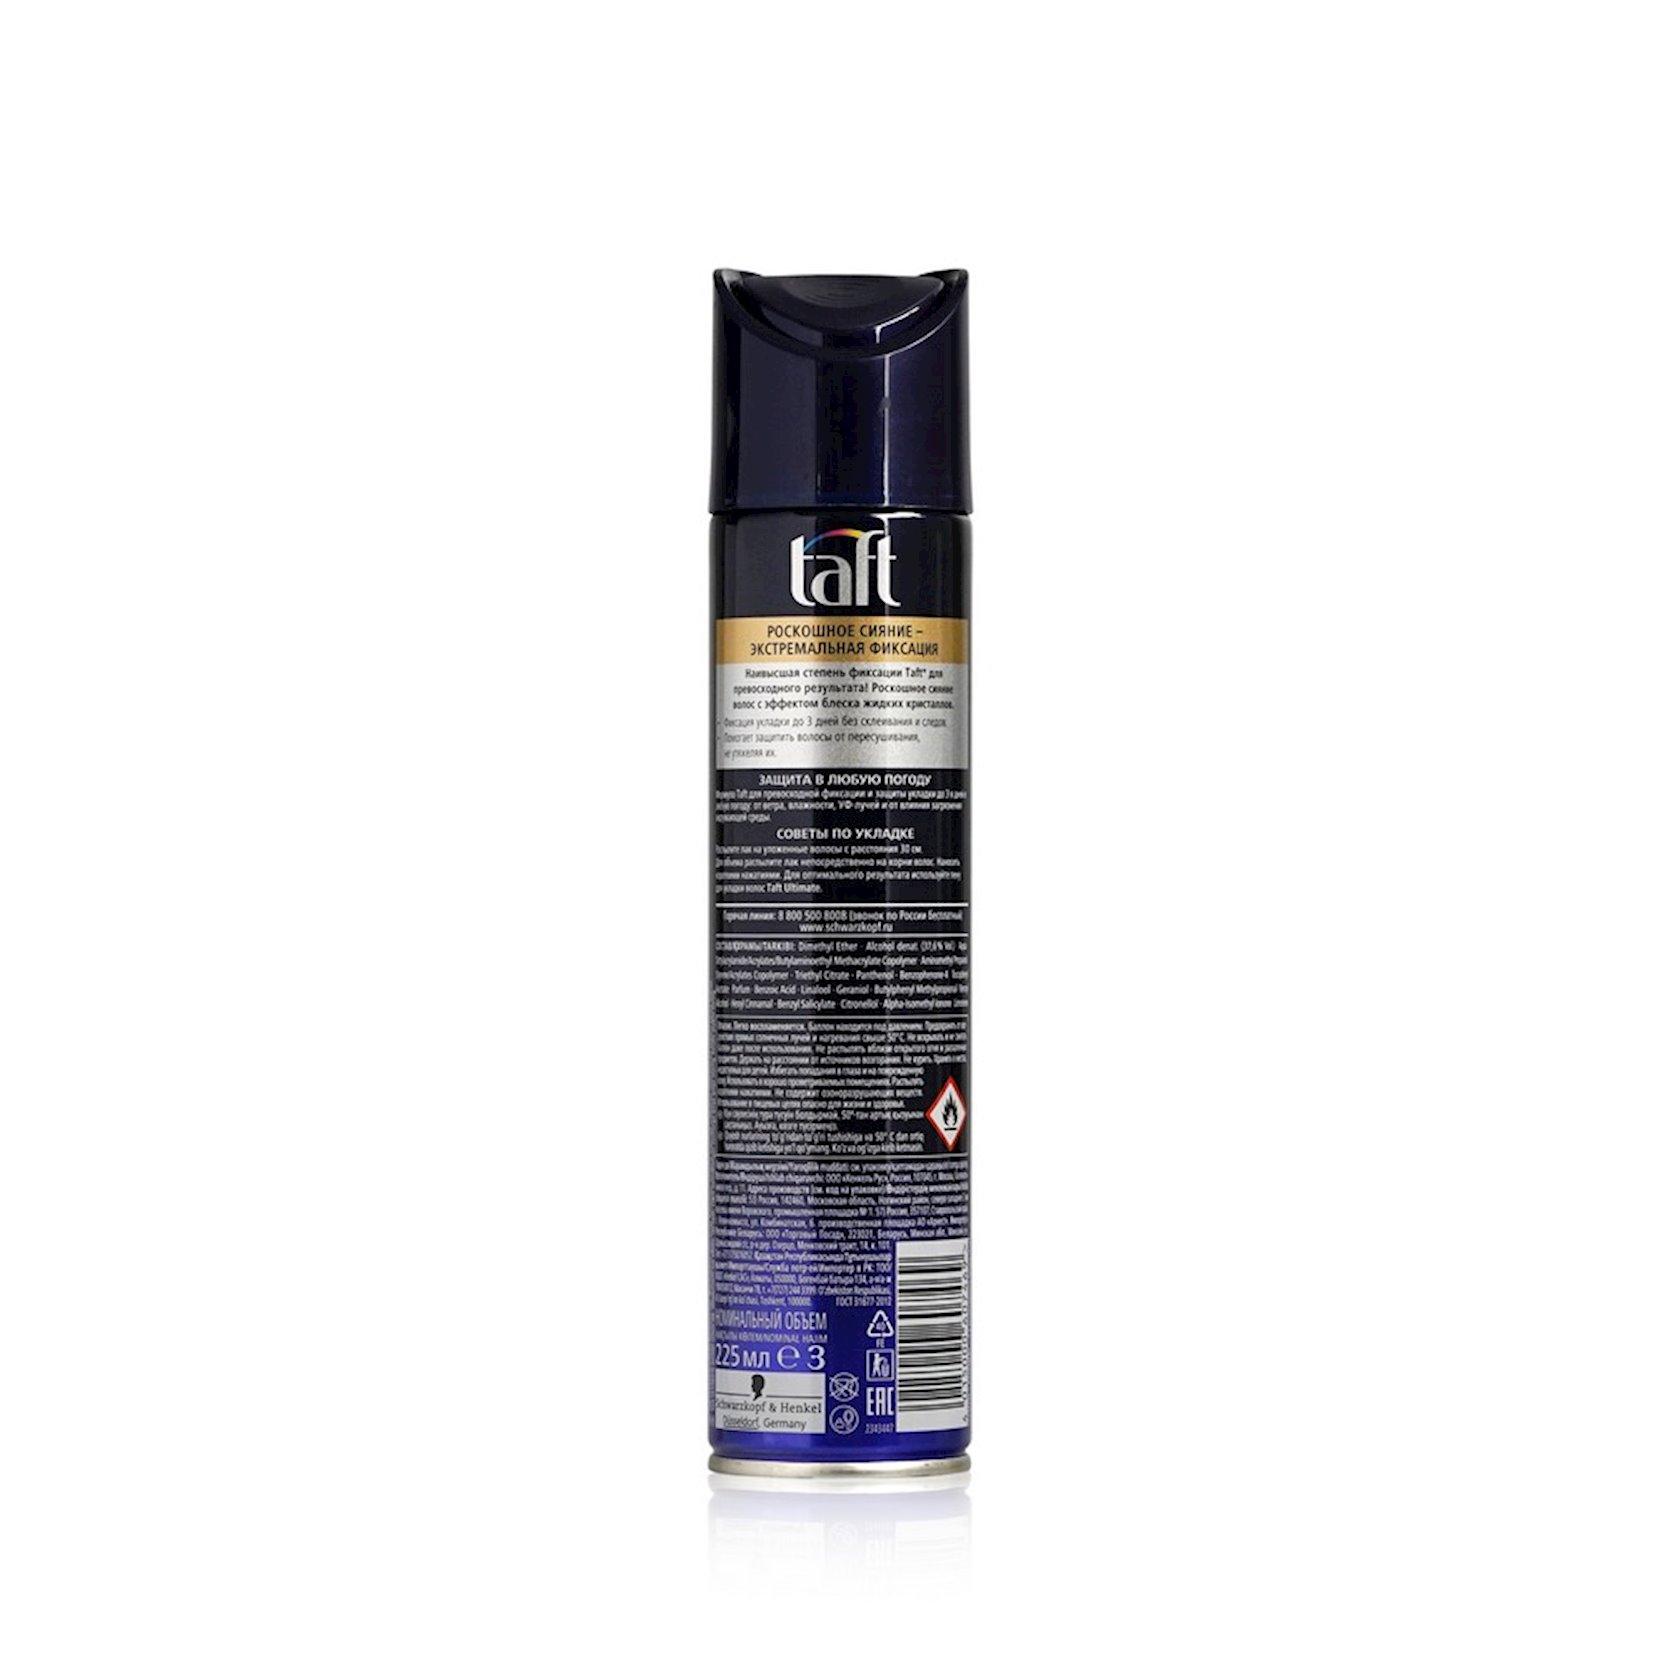 Saç lakı Taft Ultimate Ekstremal fiksasiya 225 ml